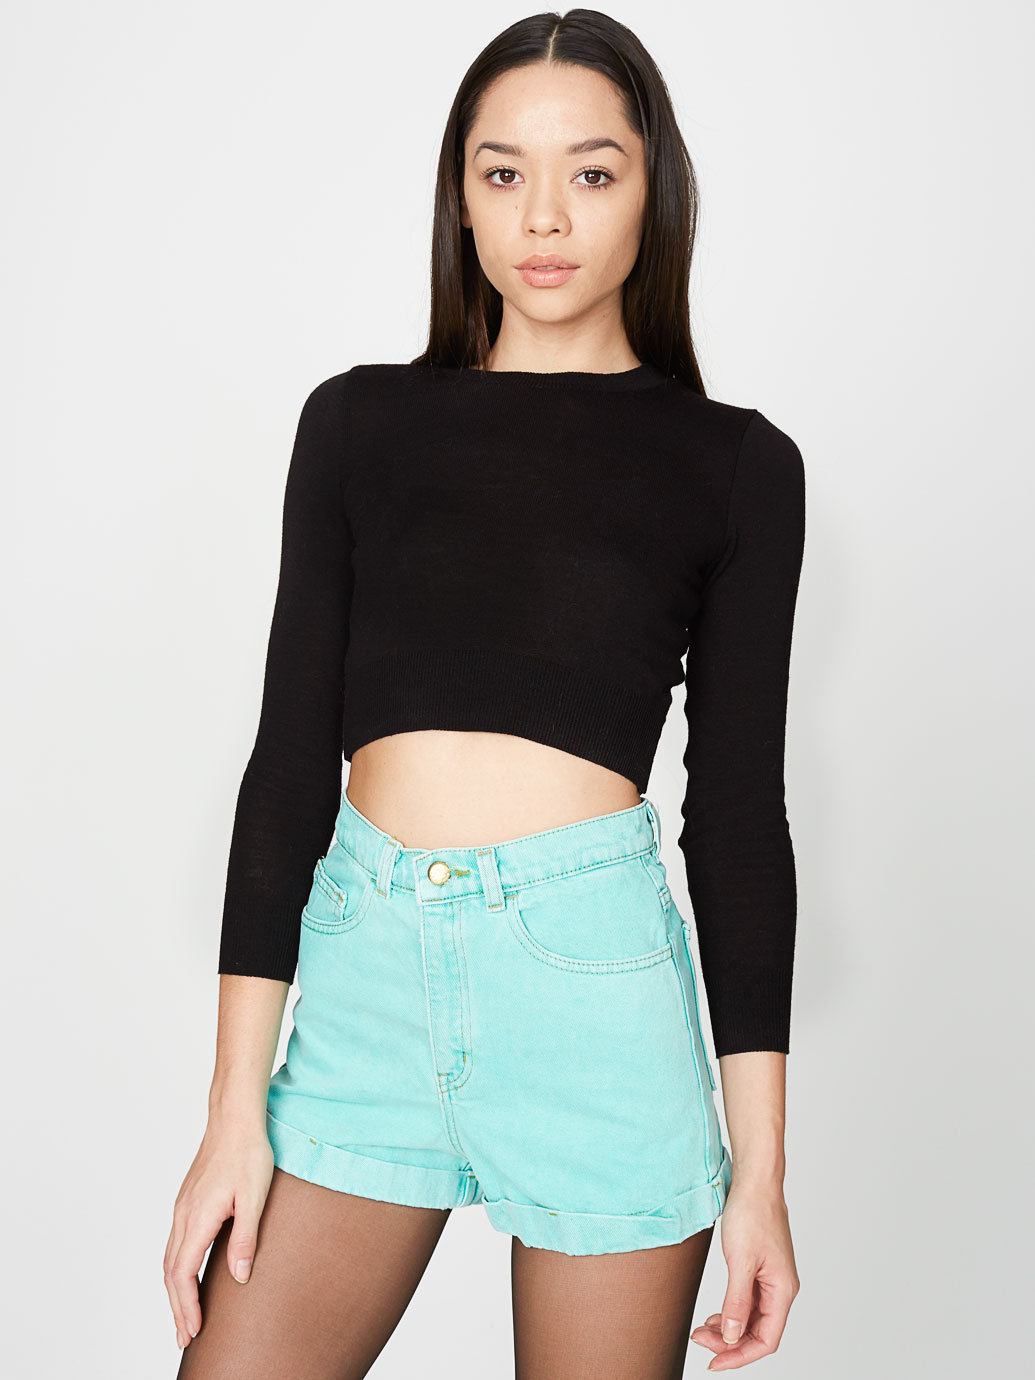 Waist jean cuff short